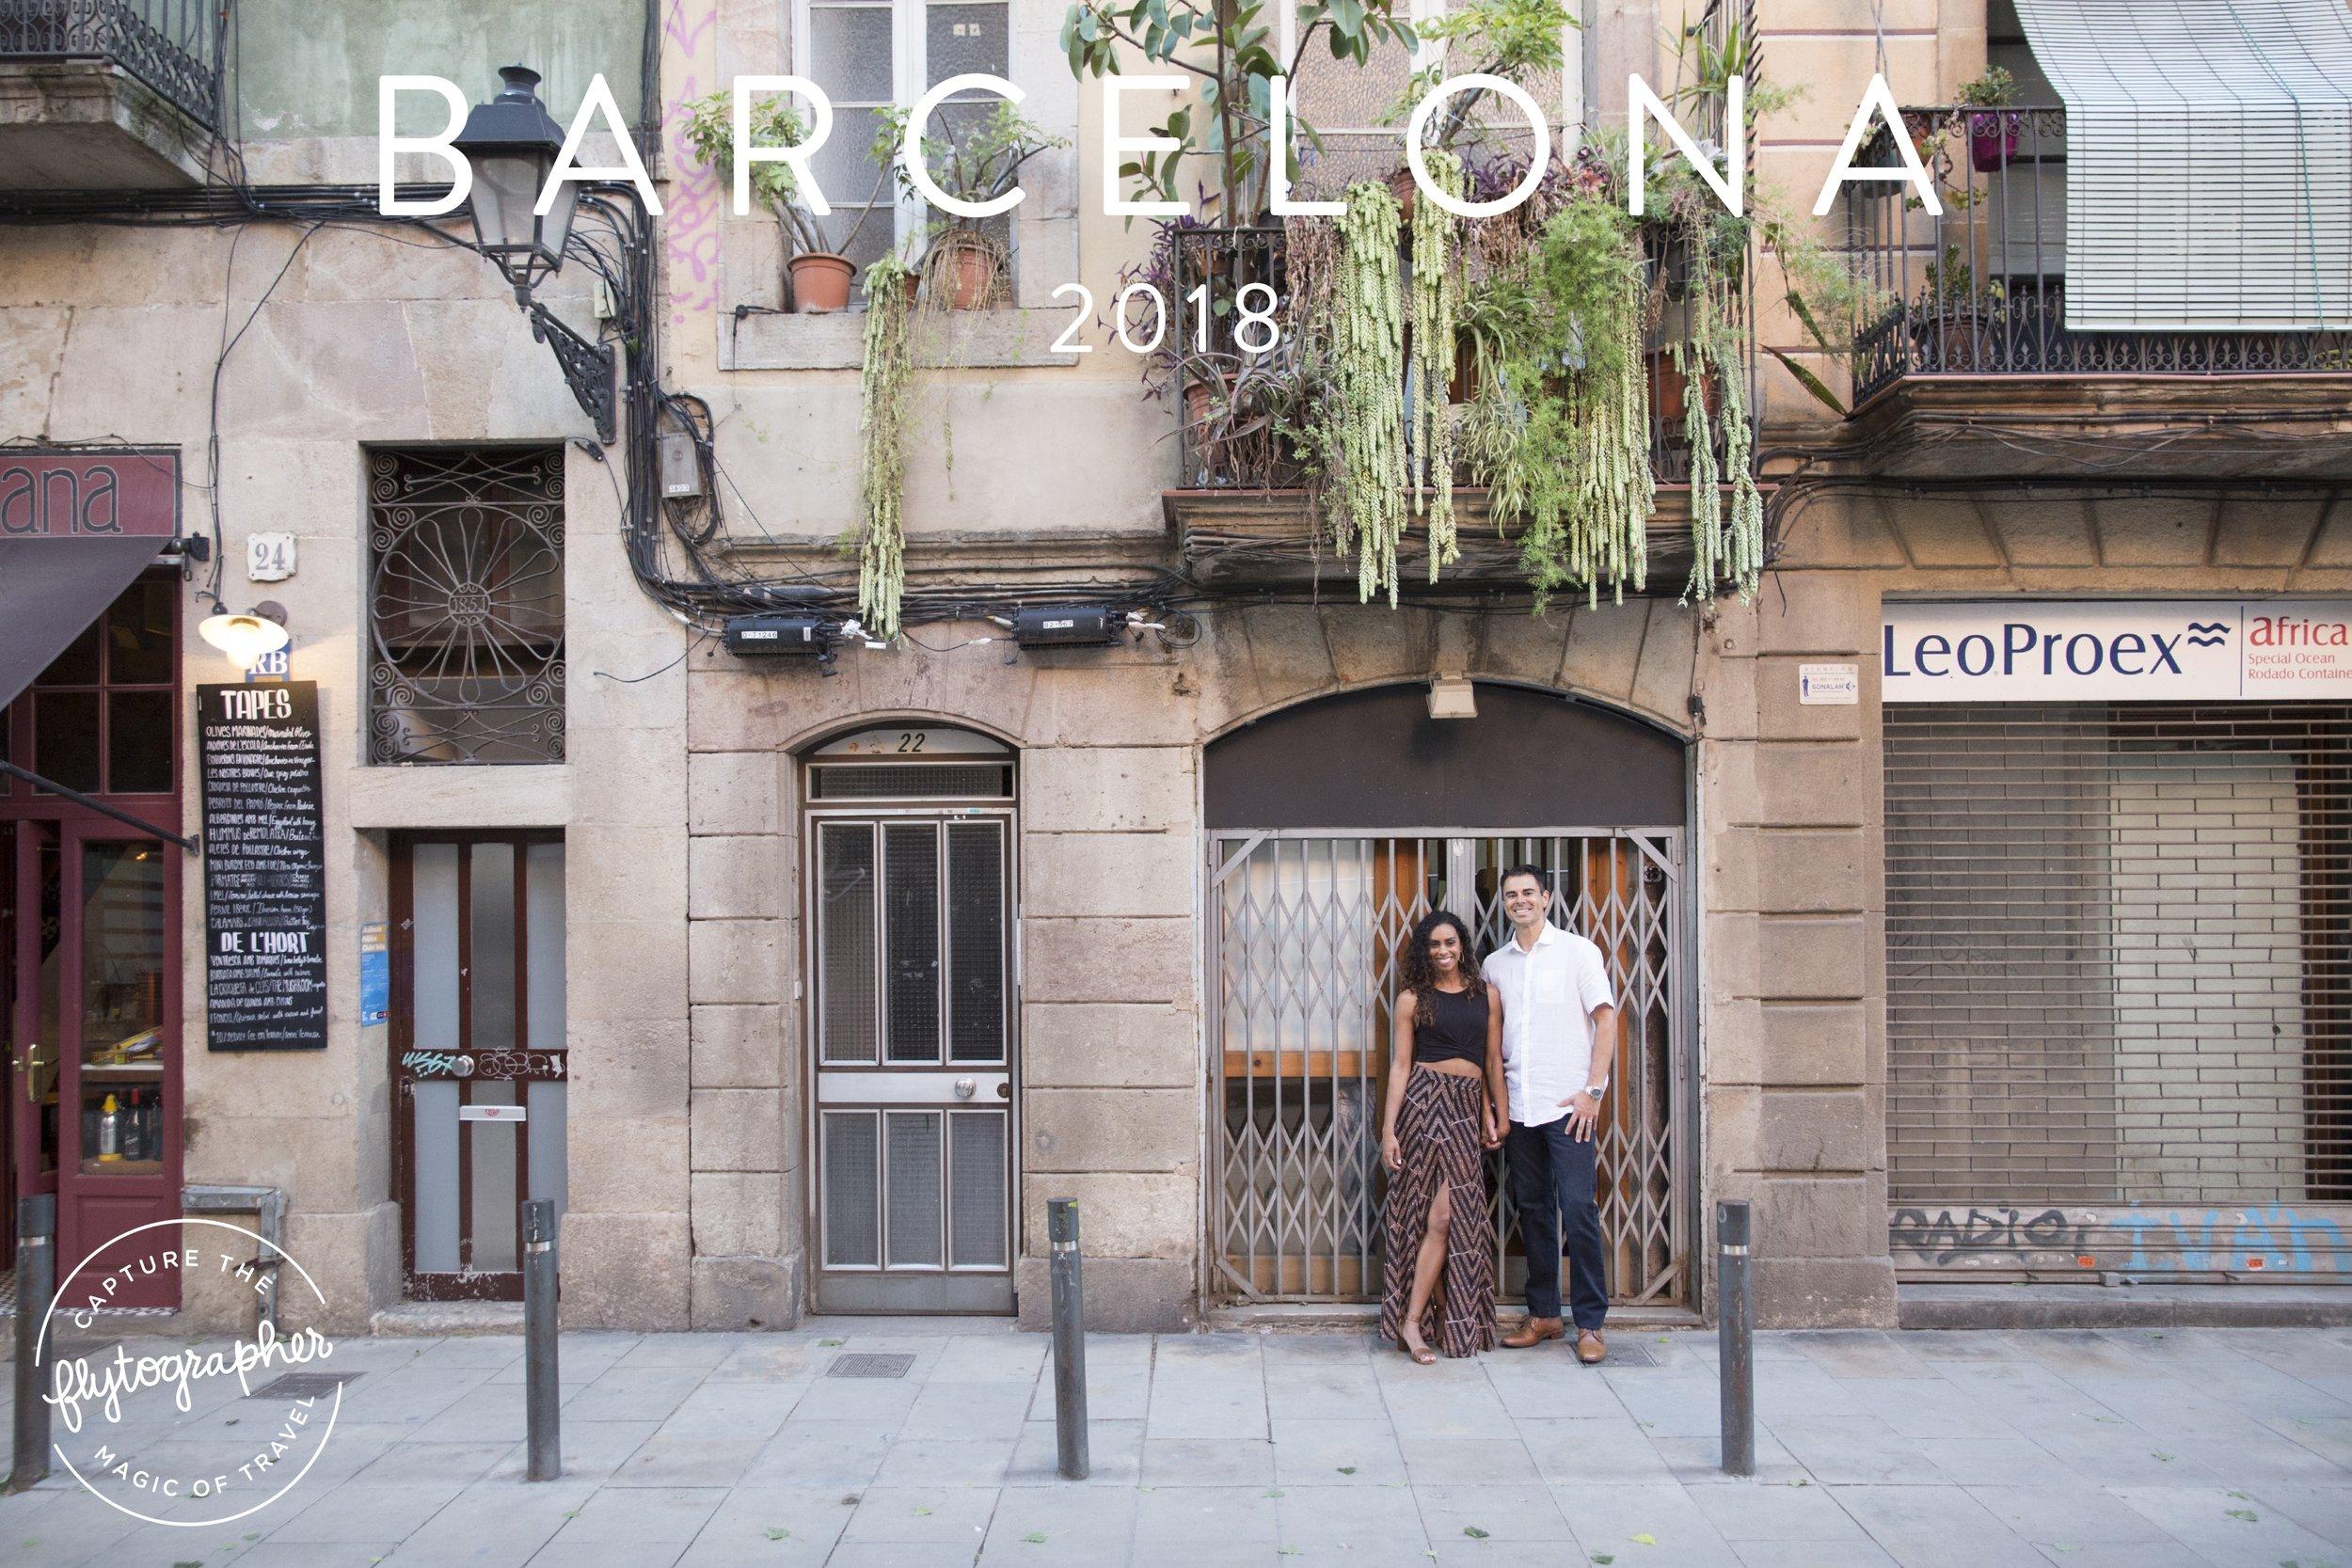 Flytographer photoshoot in Barcelona